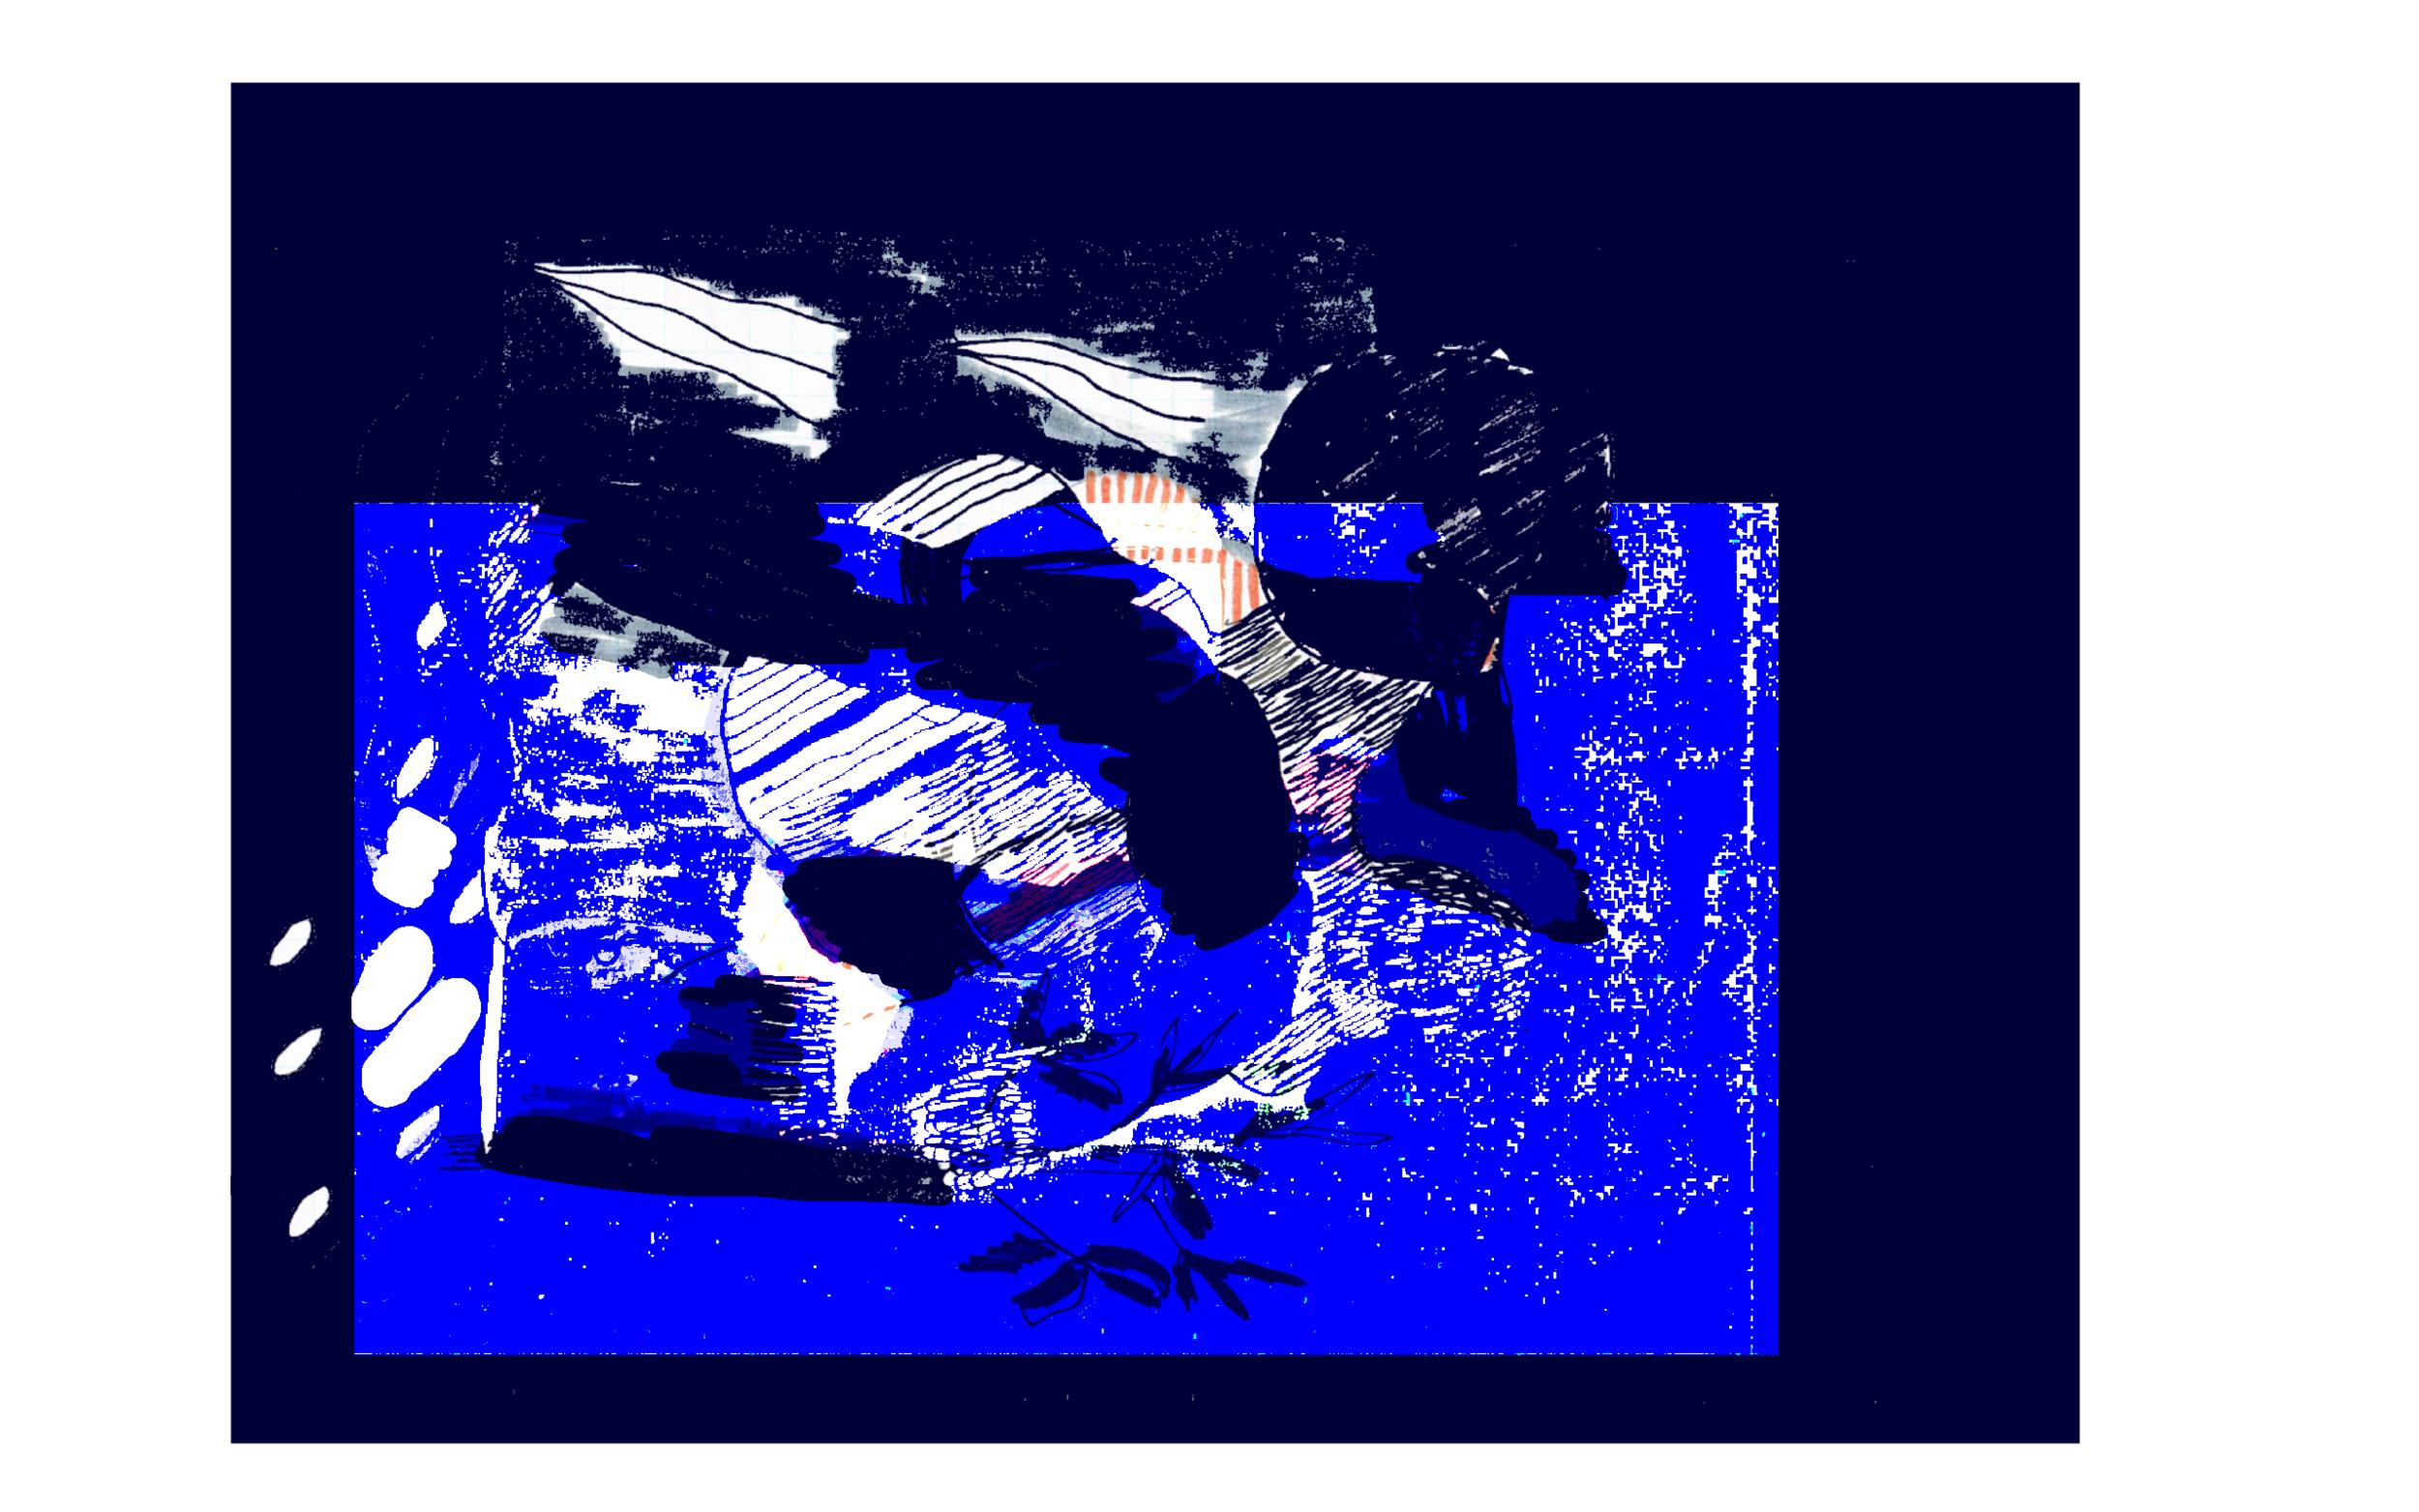 artflow_2017012702521.png